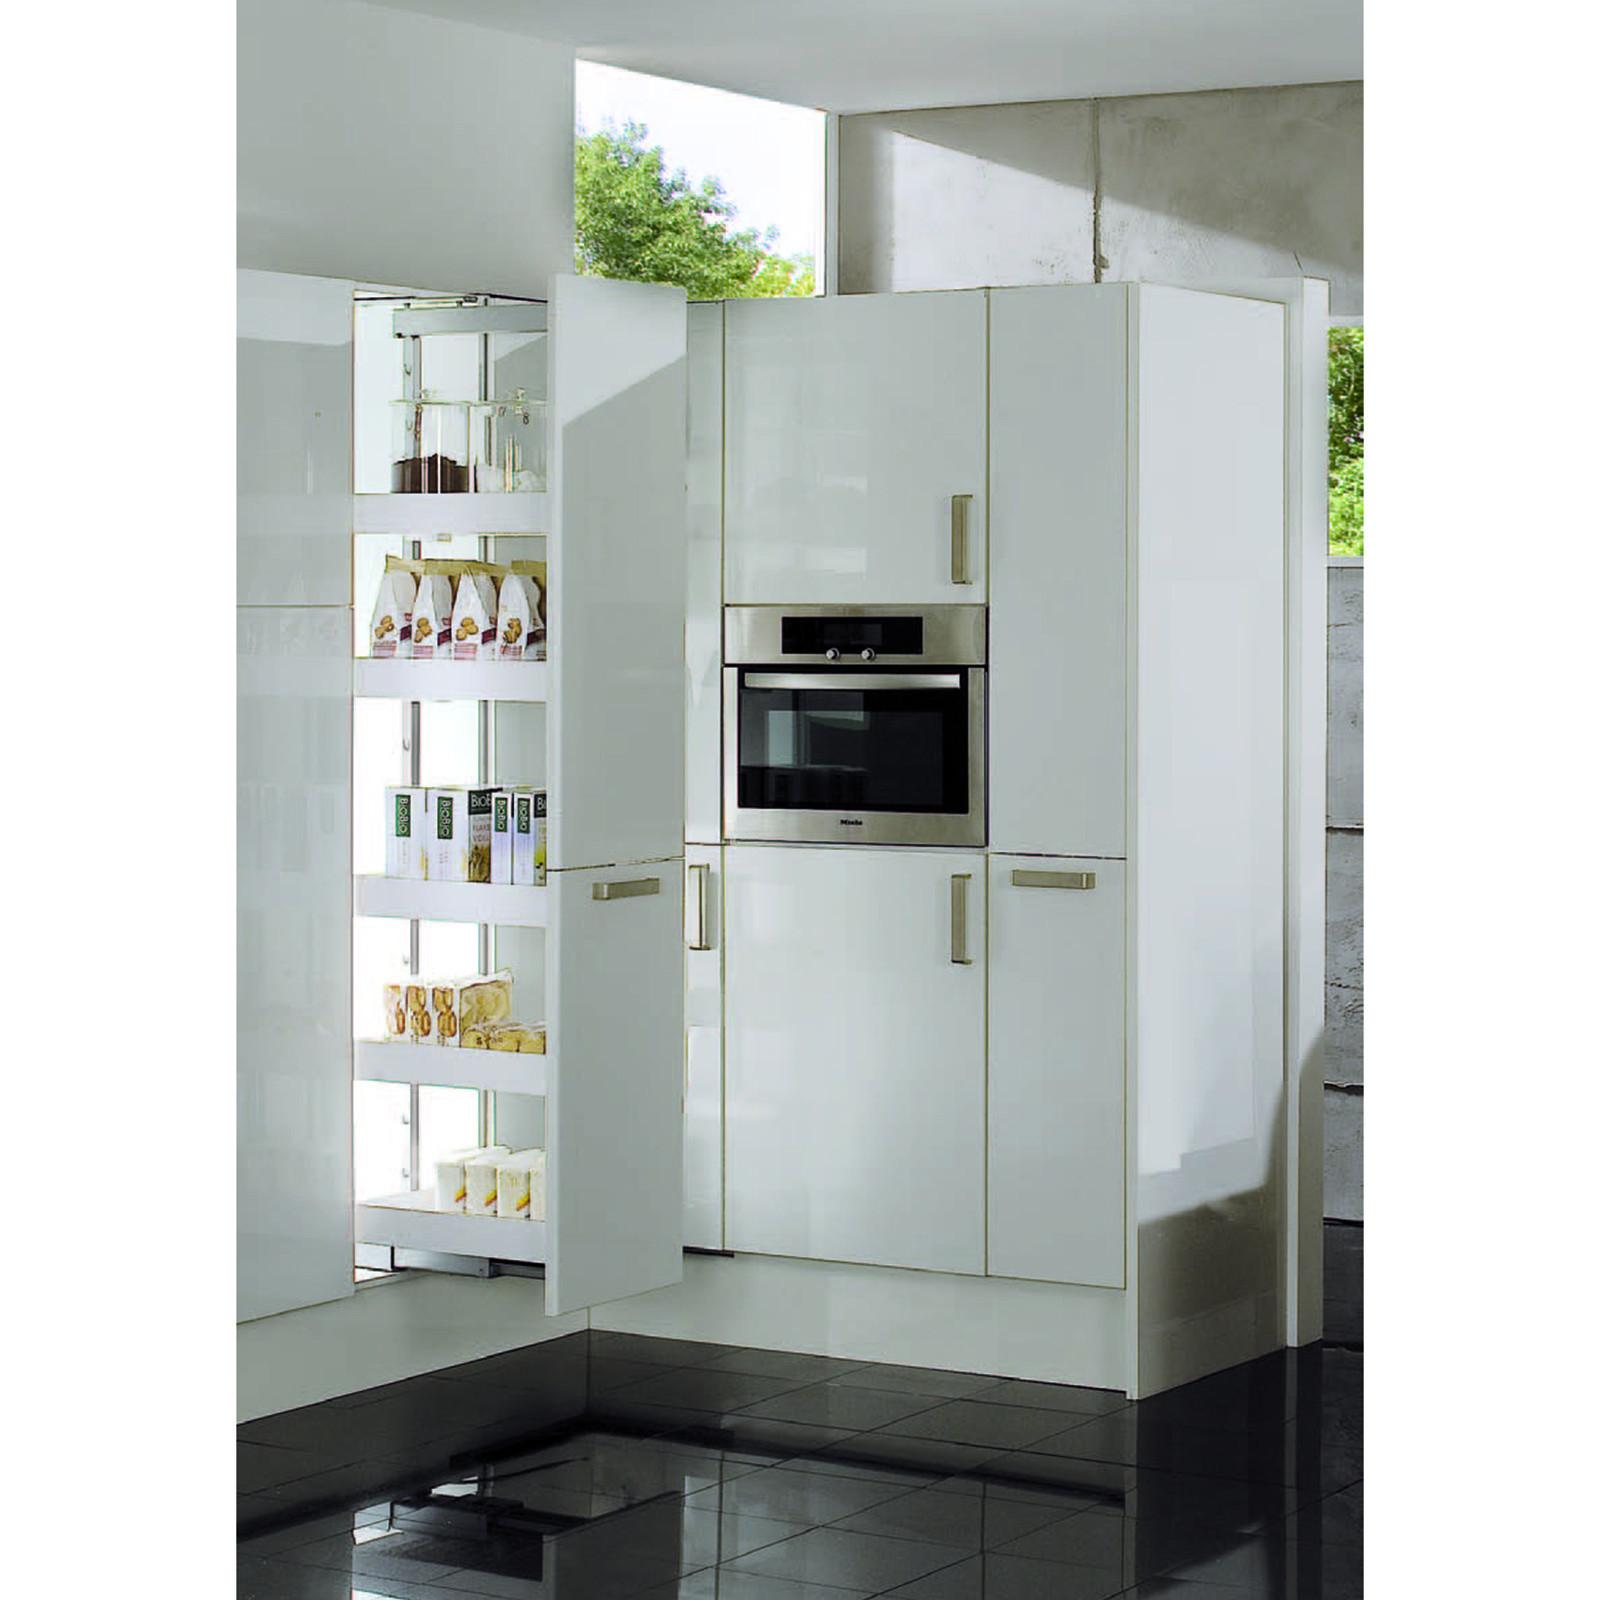 Küche Apothekerschrank Einsatz   Ikea Kuche Apothekerauszug Kuche Mulleimer Auszug Kuche Mit